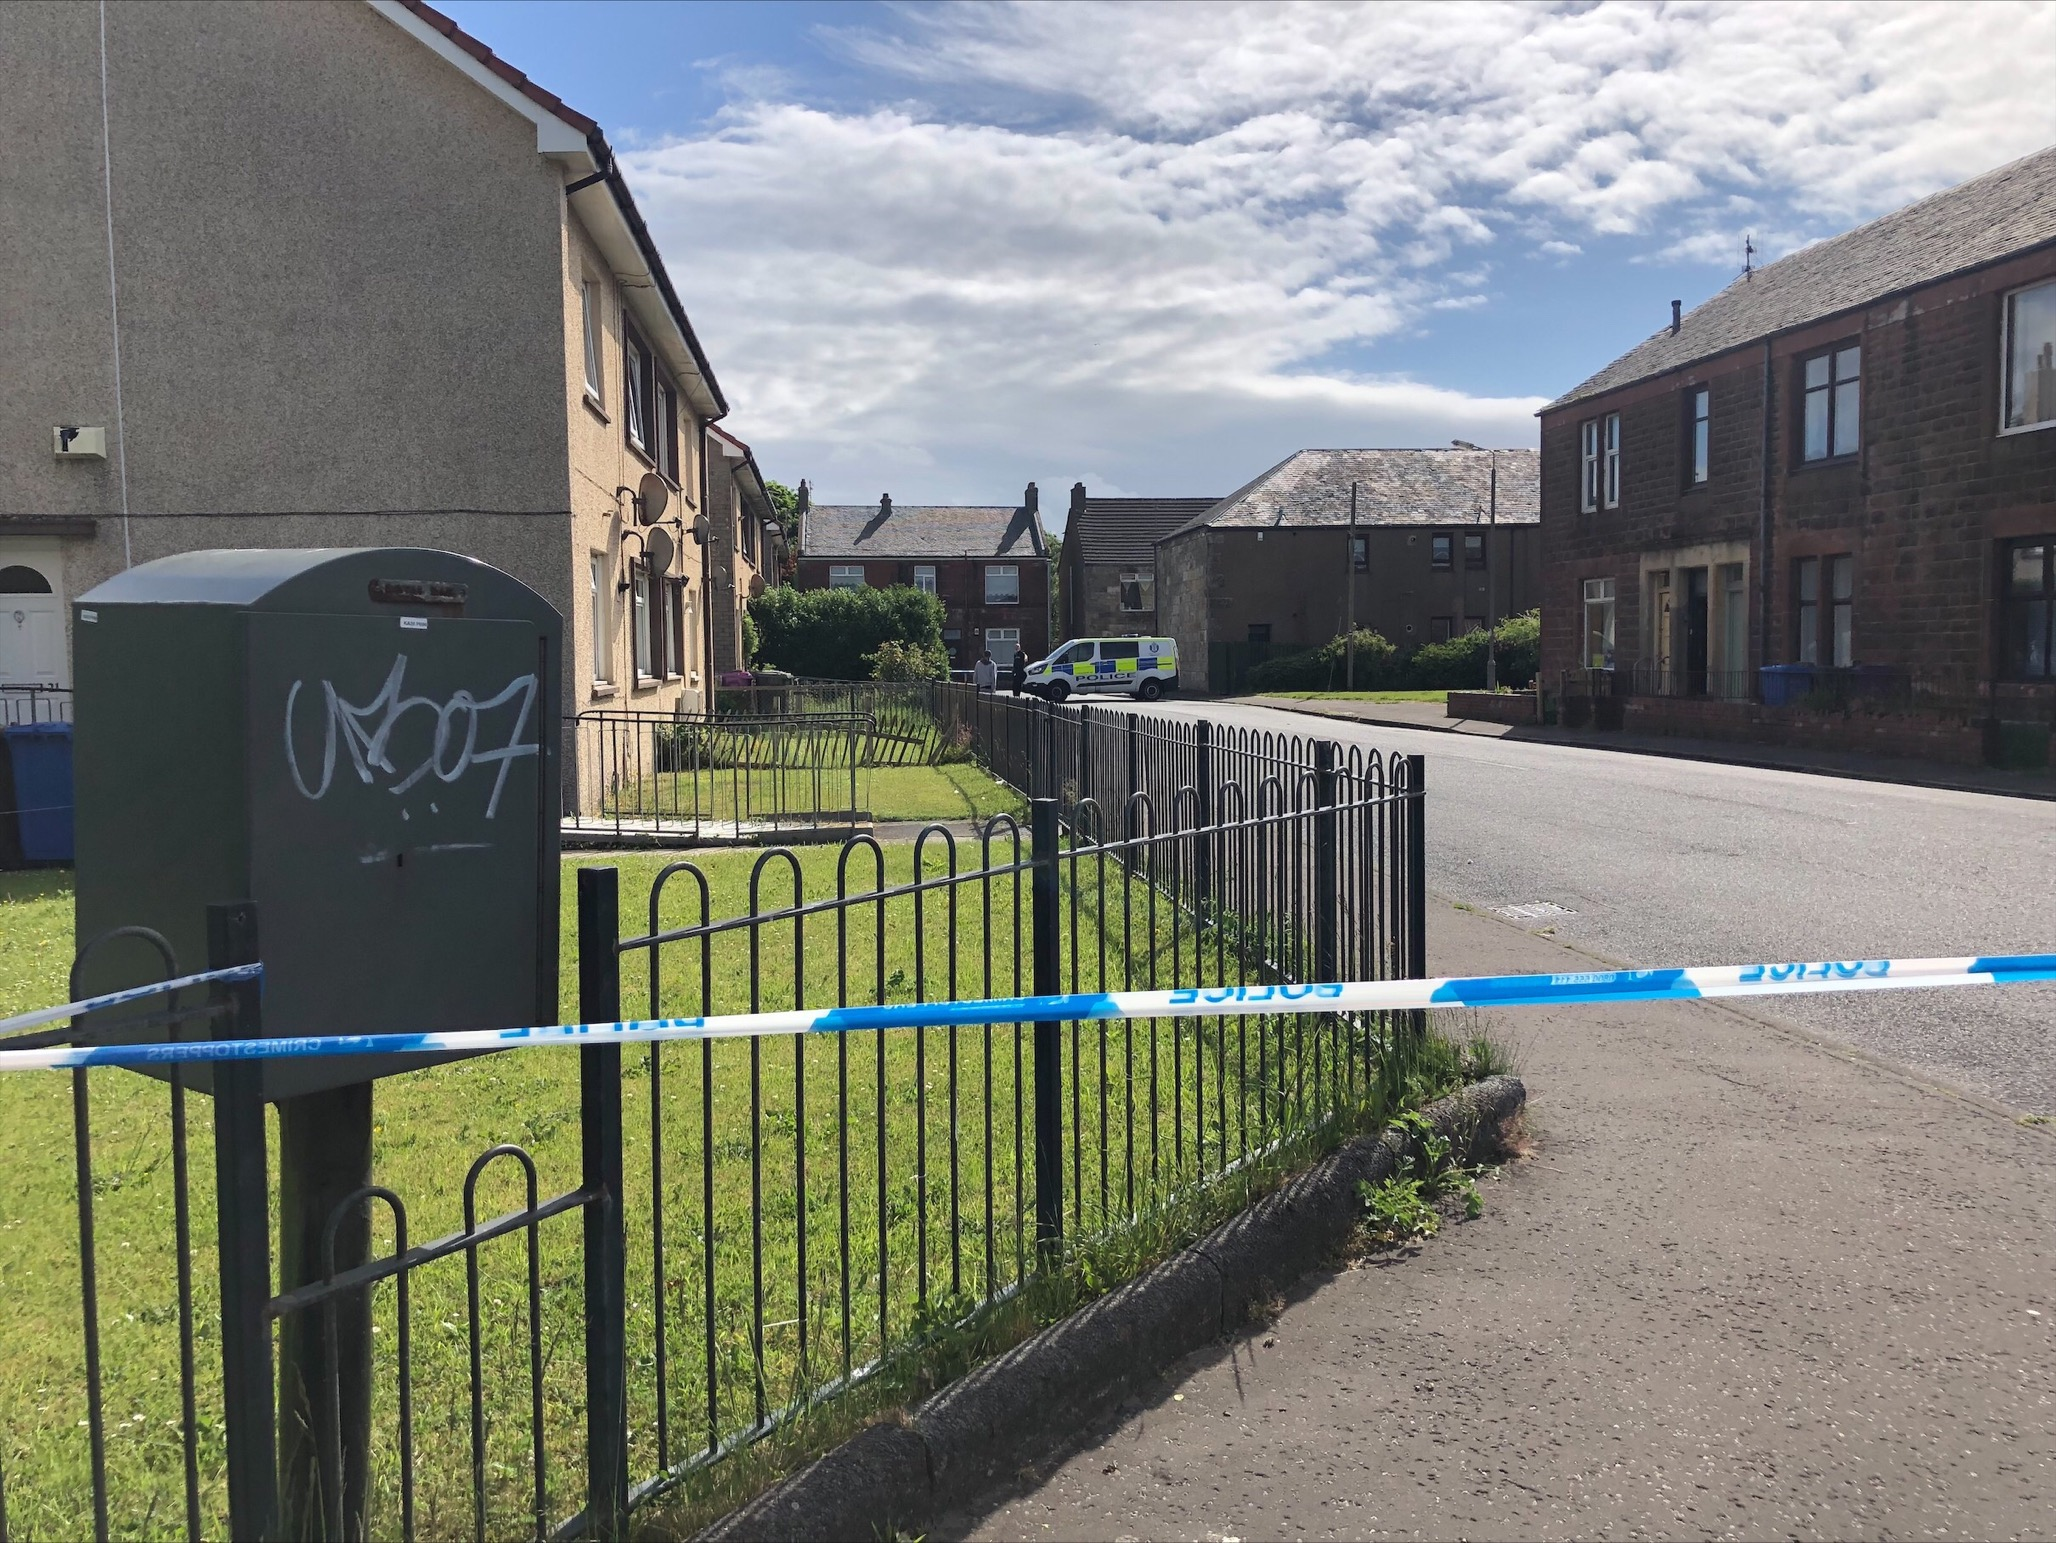 Arthur Street:  Man in hospital after 'disturbance' in Stevenston